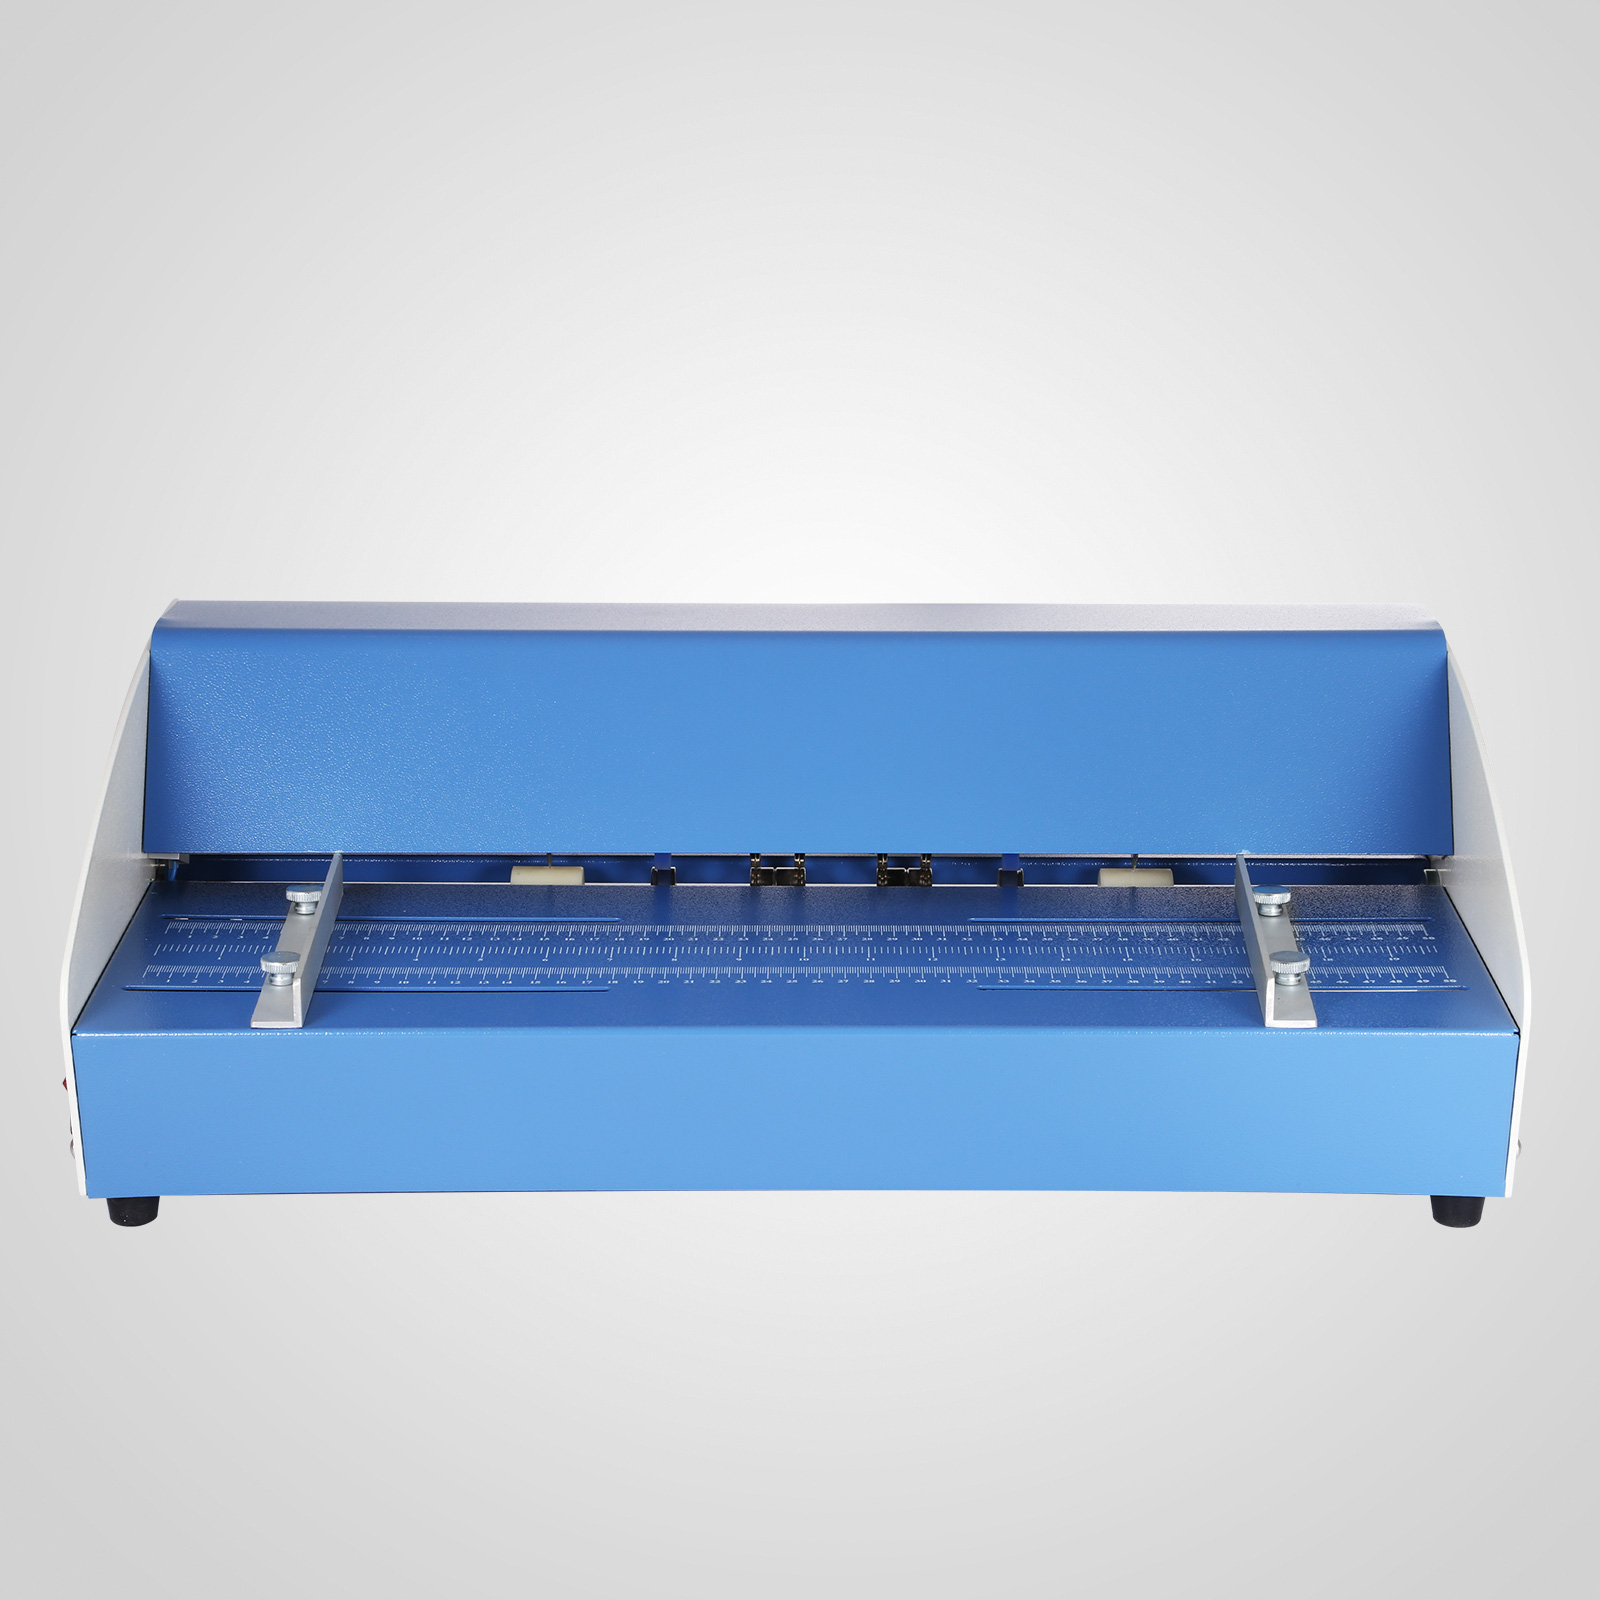 Cordonatrice-Perforatrice-Max-350-520mm-Profondita-Regolabile-Elettrica-Manuale miniatura 19